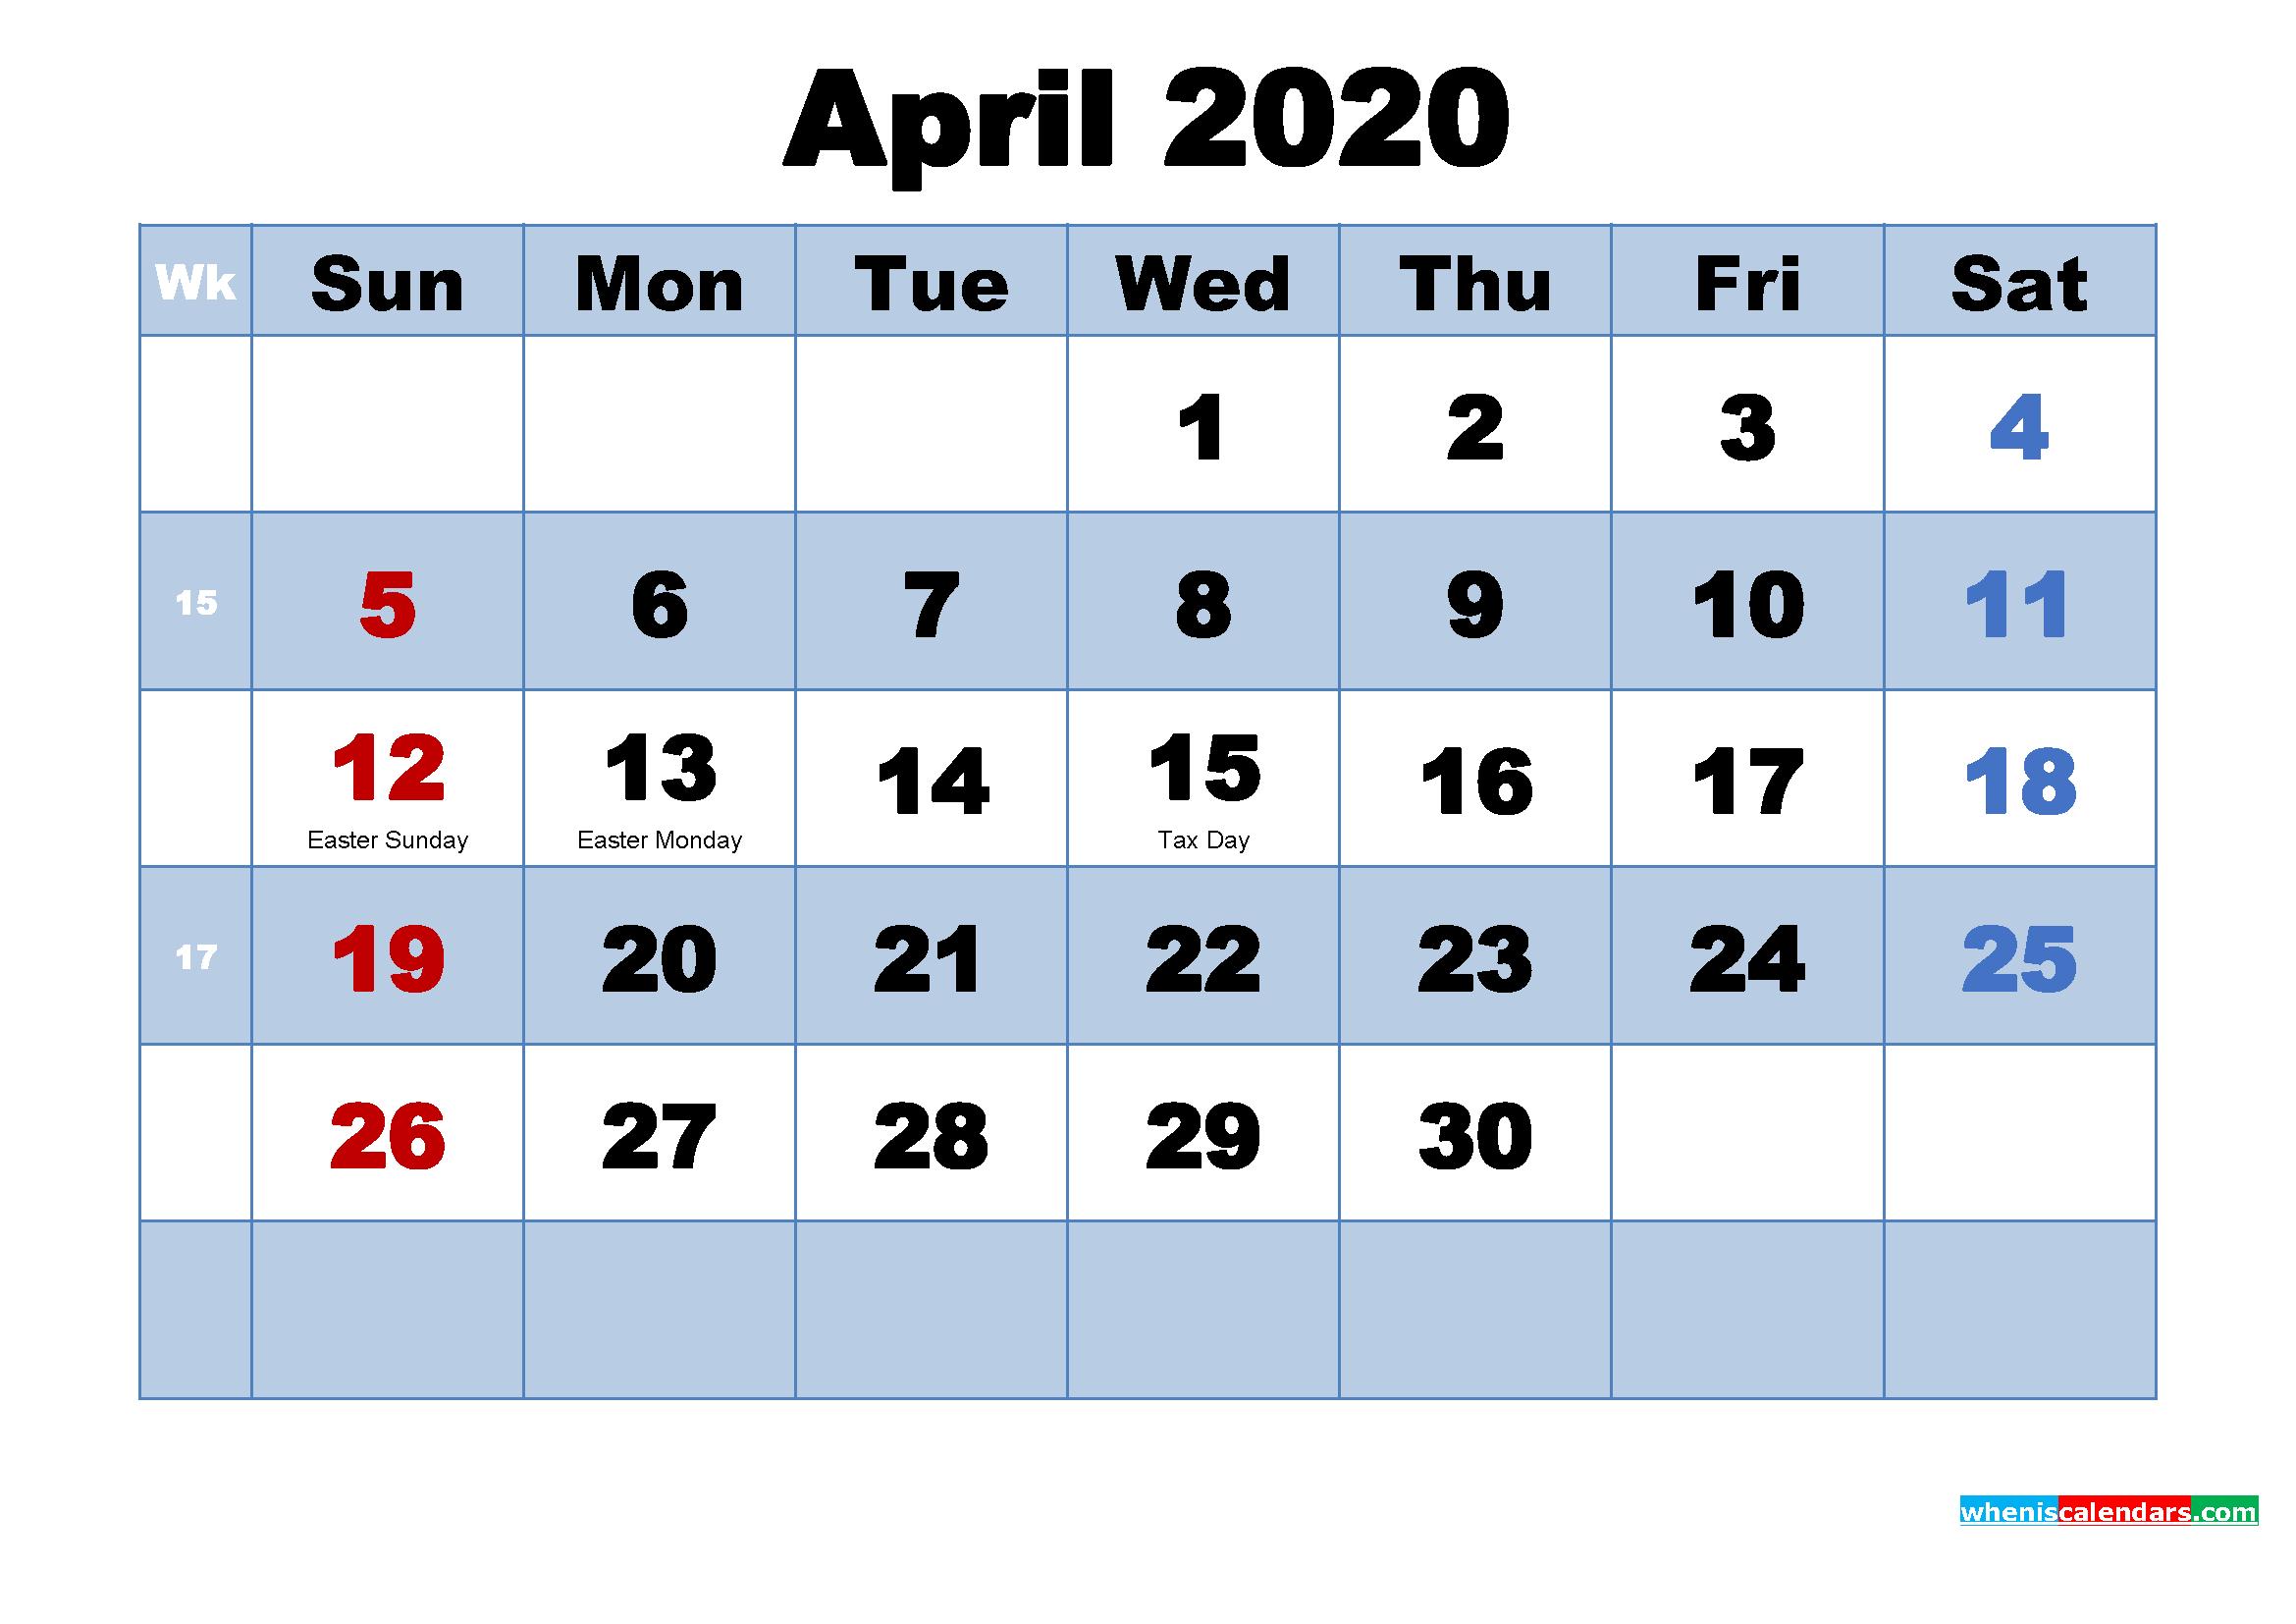 April 2020 Calendar with Holidays Printable